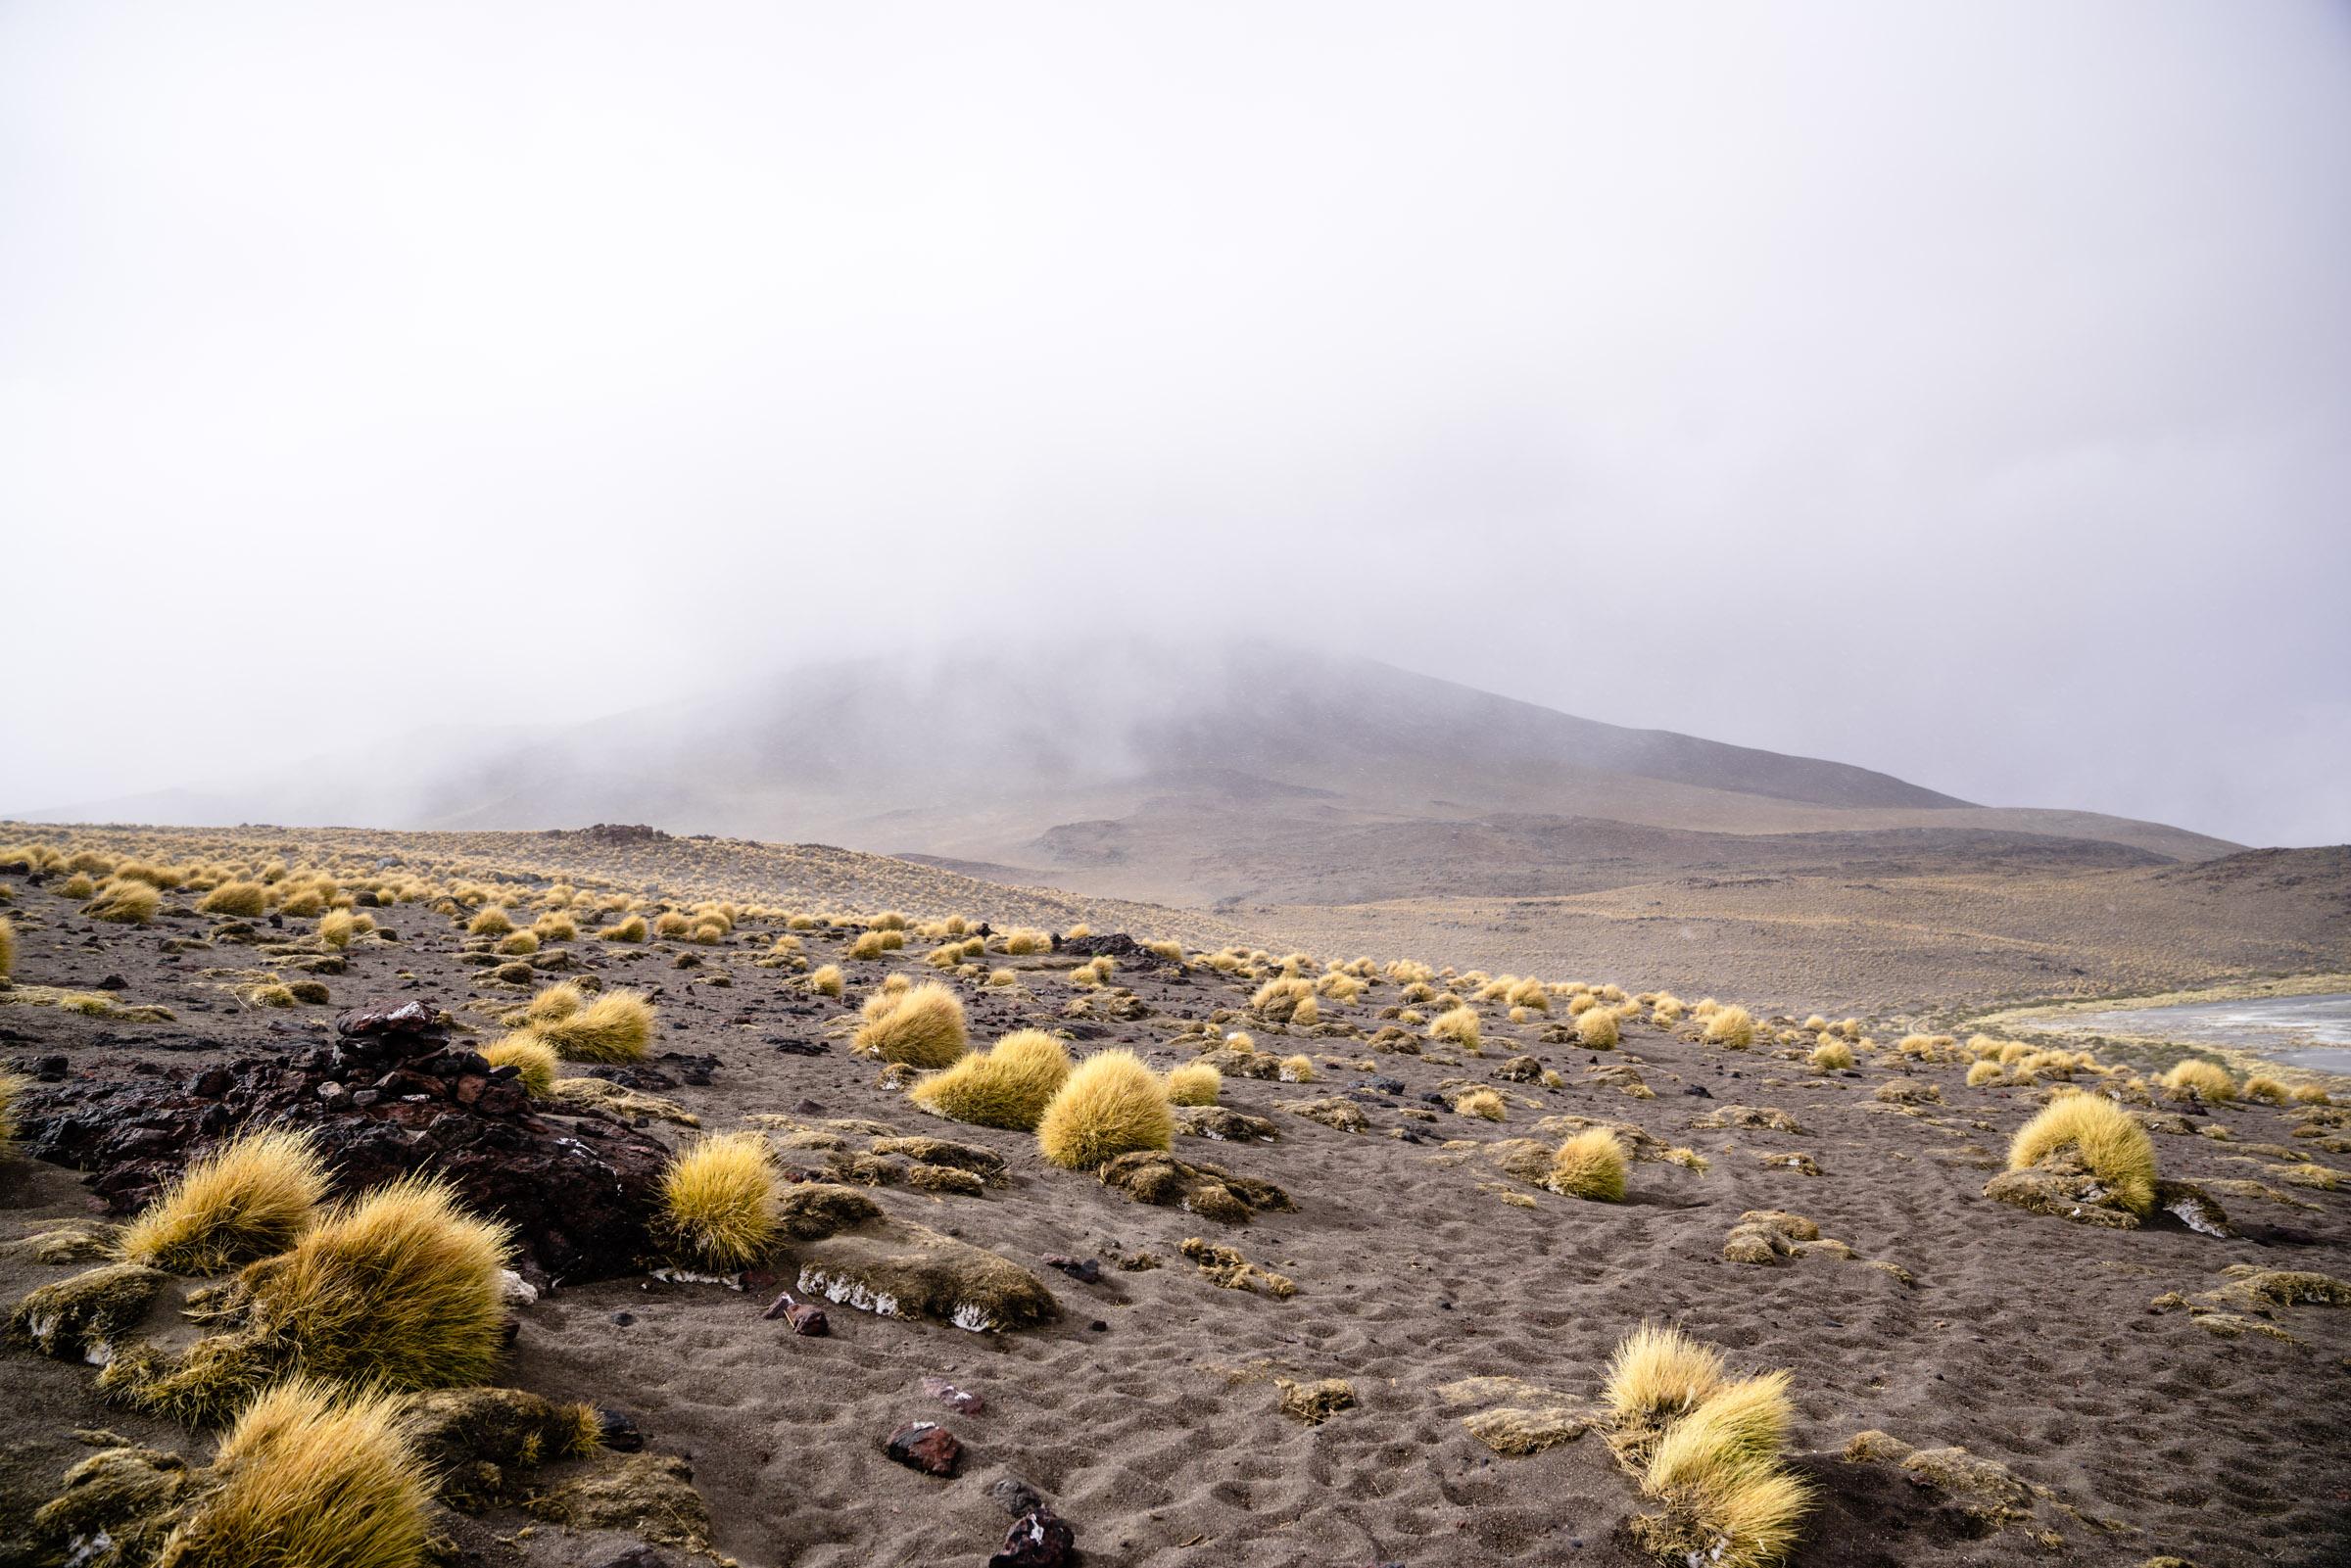 Foothills of Laguna Colorade. Bolivia